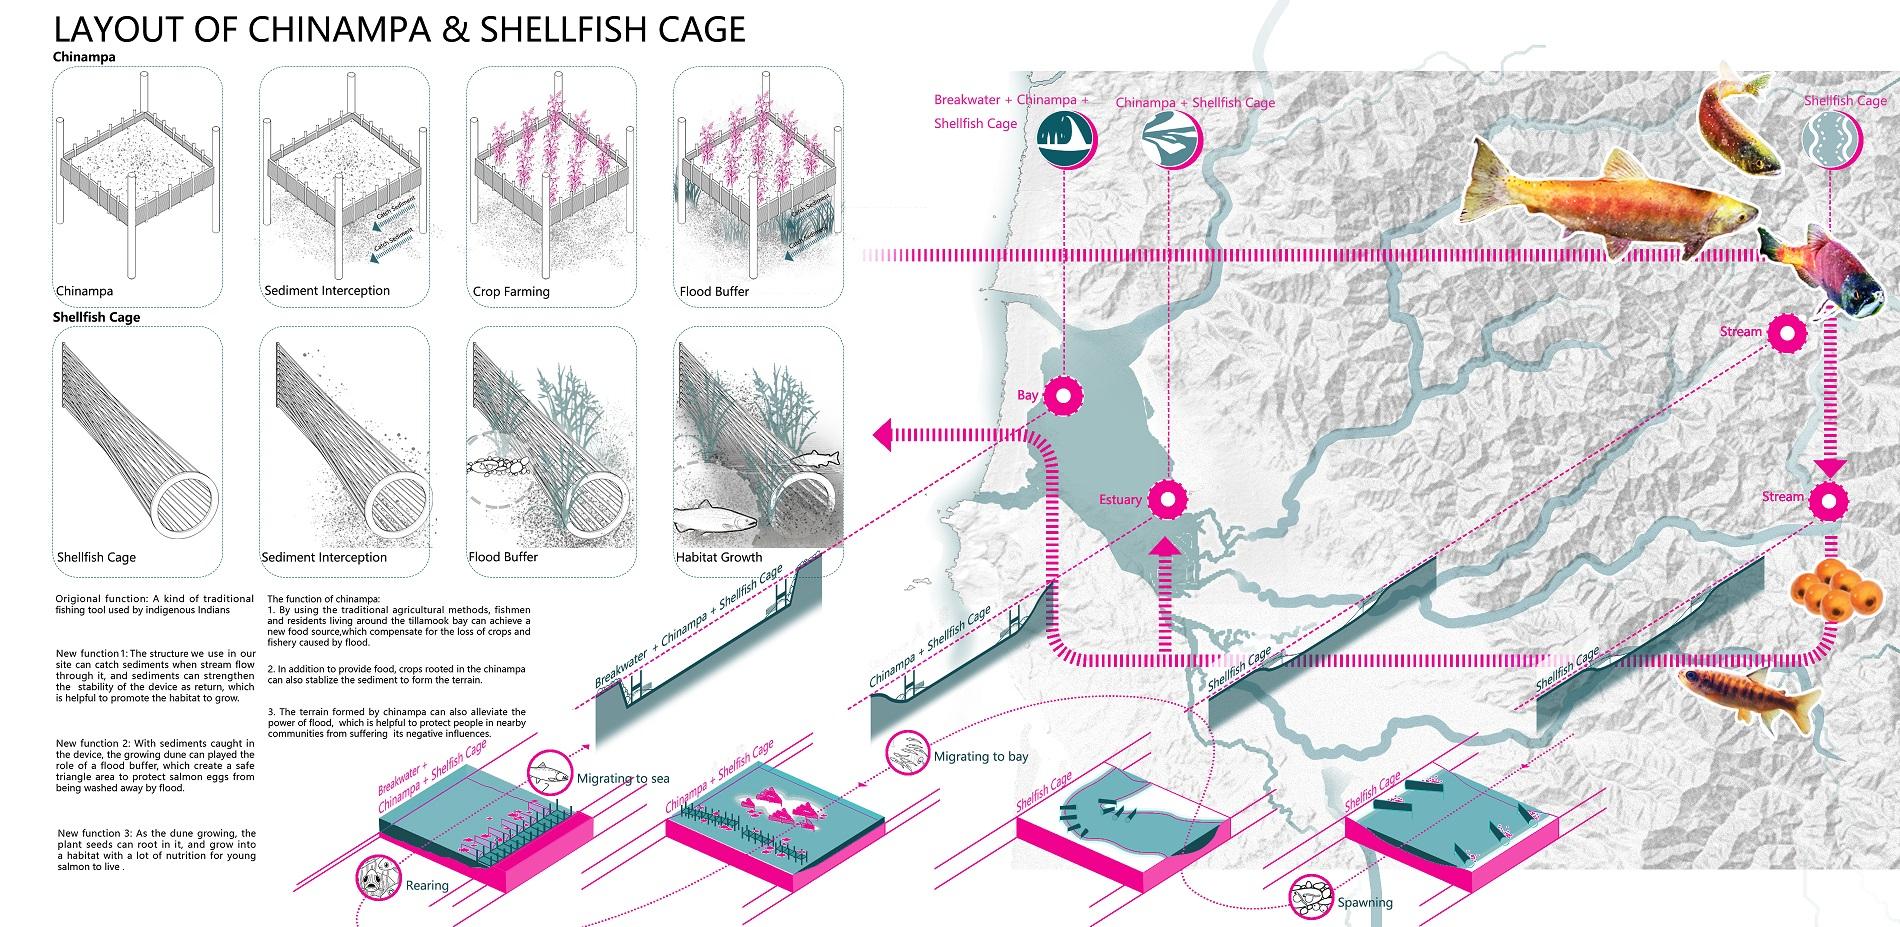 Layout of chinampa & shellfishcage